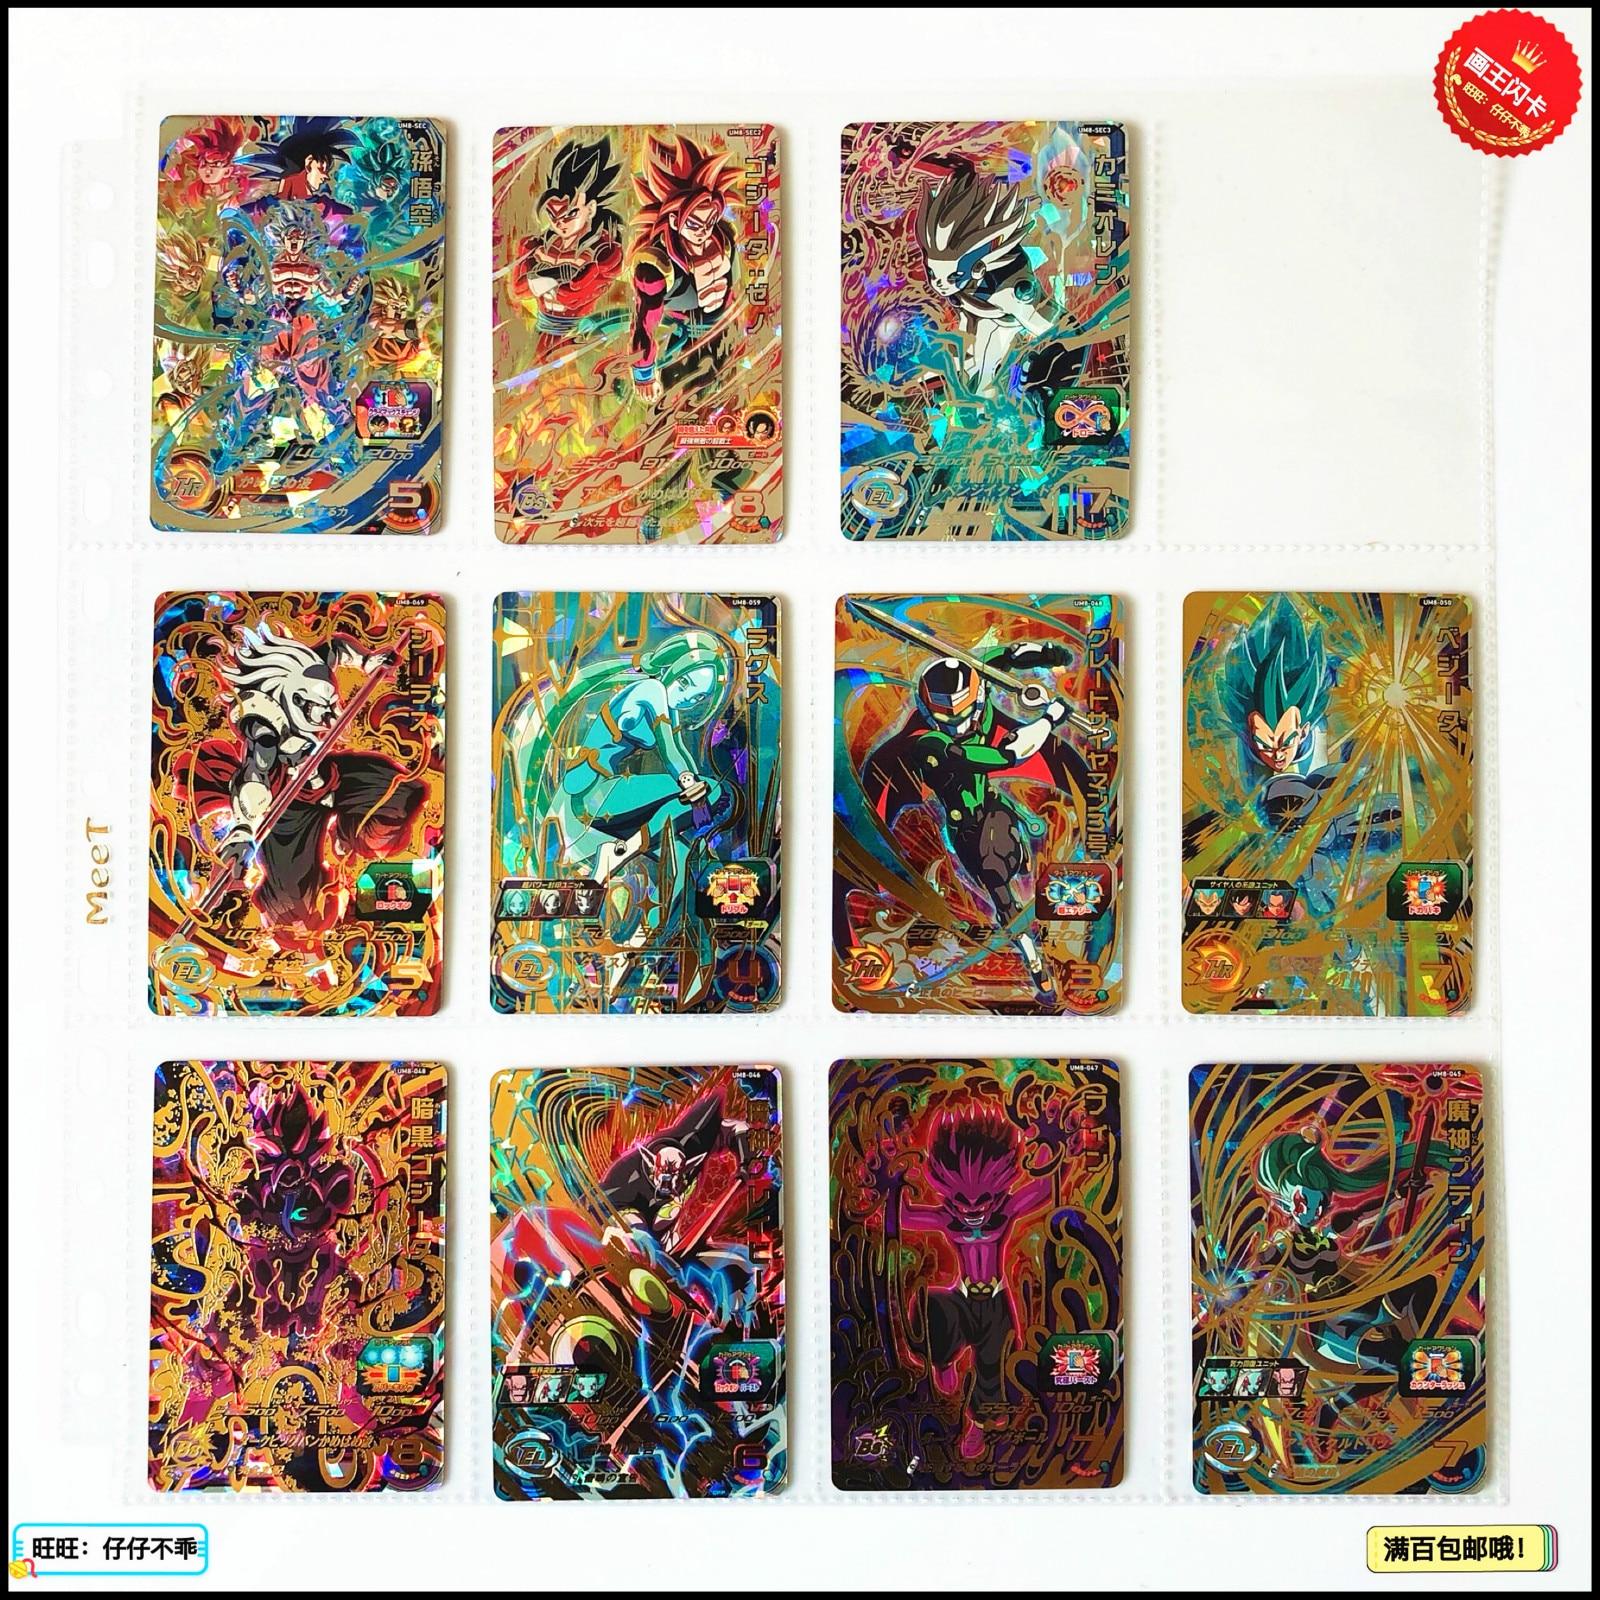 Japan Original Dragon Ball Hero Card 4 Stars UM8 SEC Goku Toys Hobbies Collectibles Game Collection Anime Cards